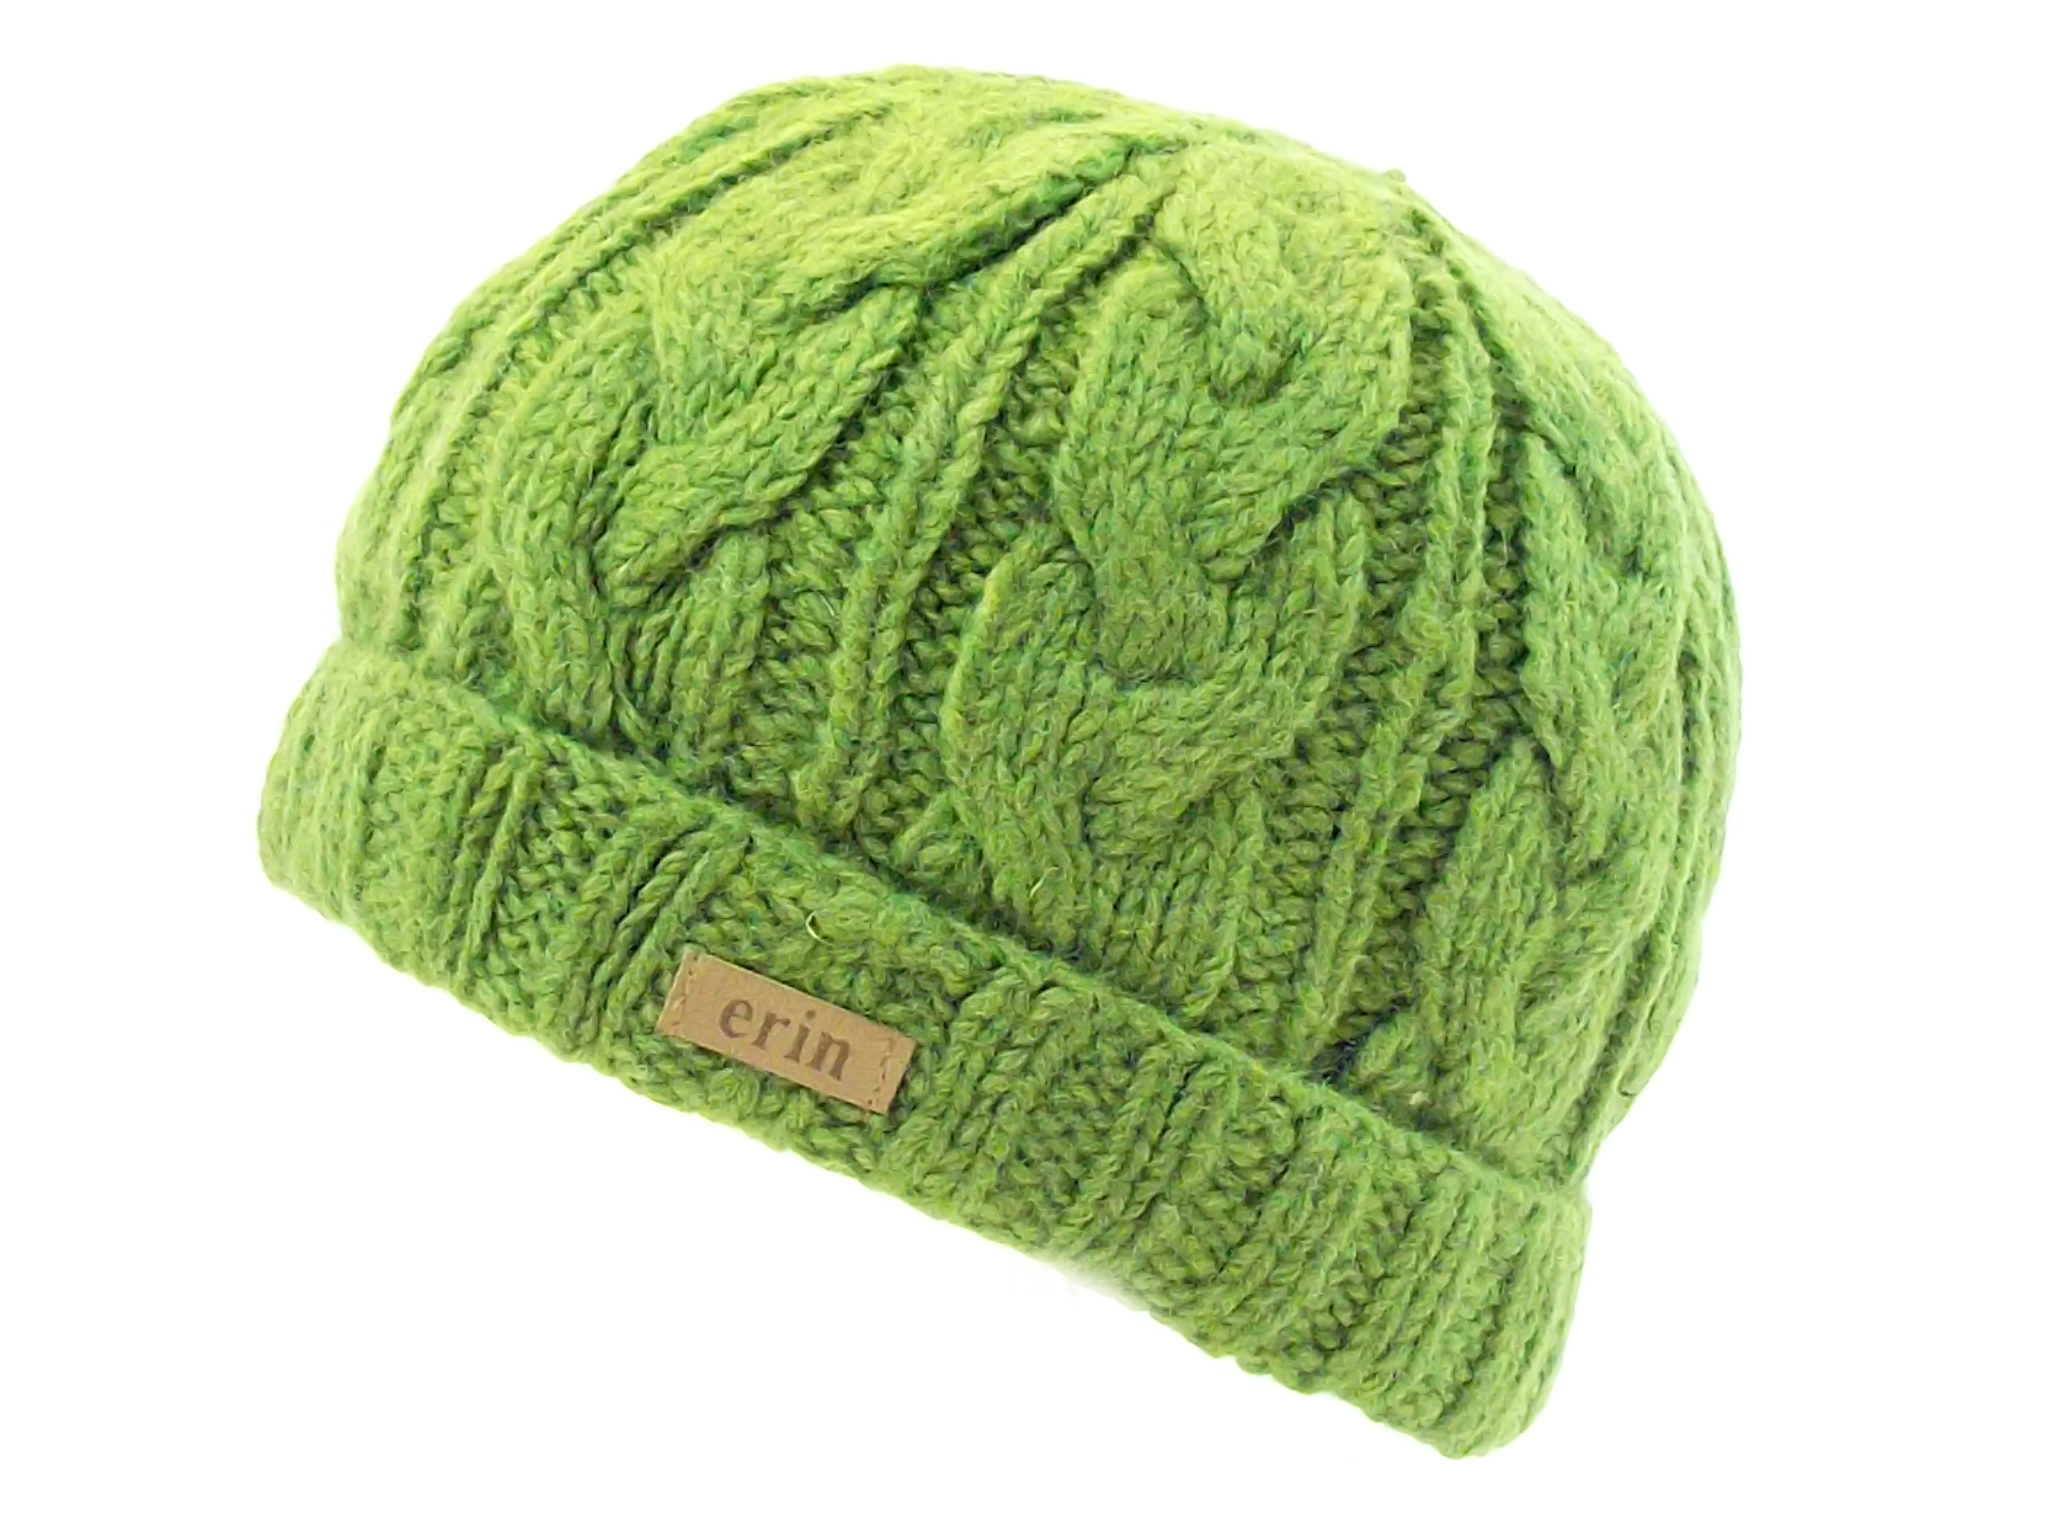 f44bf6de7 Aran Cable Turnup Hat Green